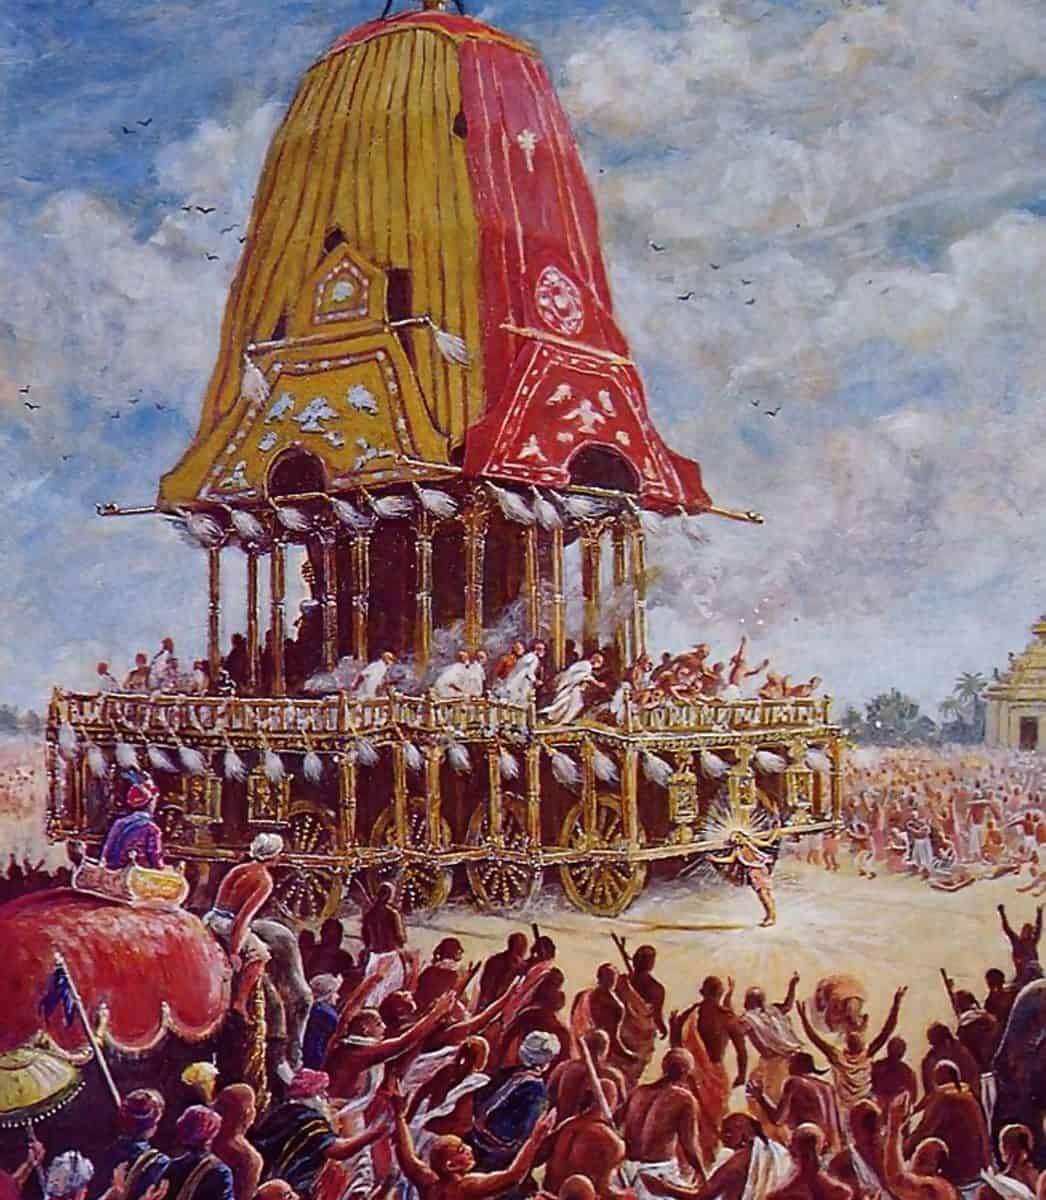 Lord Caitanya Mahaprabhu pulled the chariot from the Jagannatha Temple